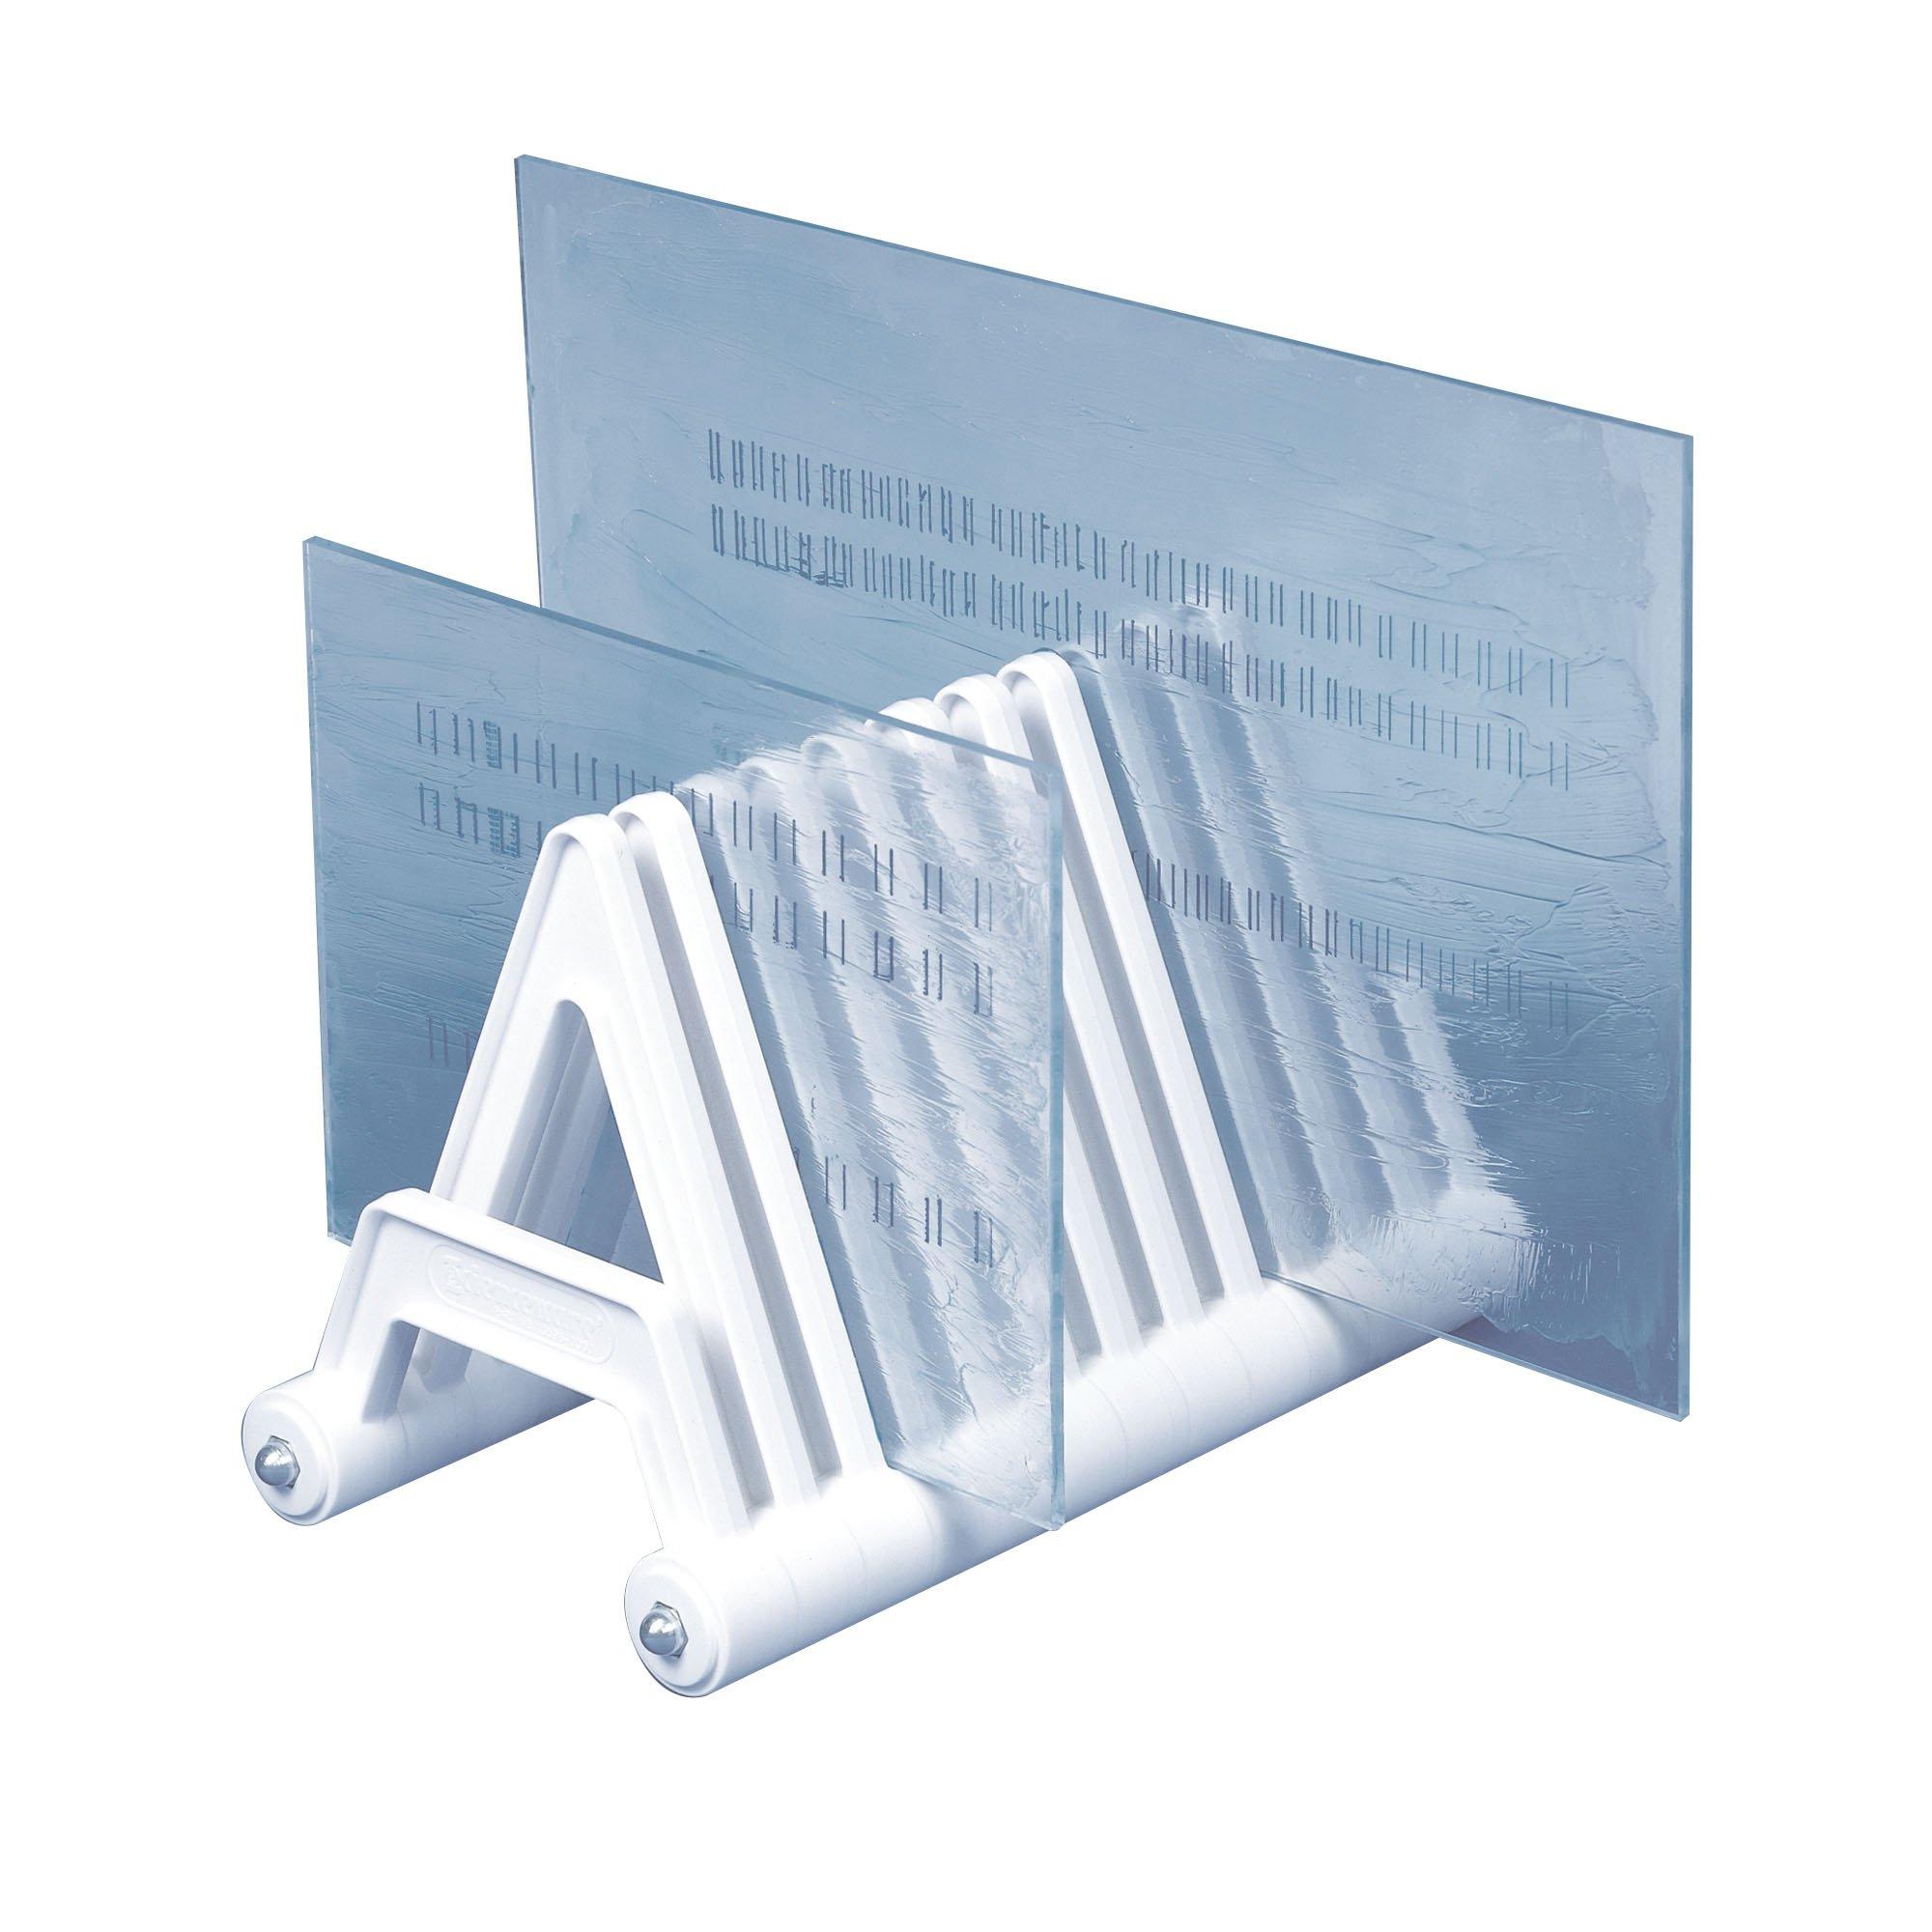 Bel-Art Electrophoresis Gel Plate Rack; Plastic, 8 x 15 x 9 in. (F13596-0000)